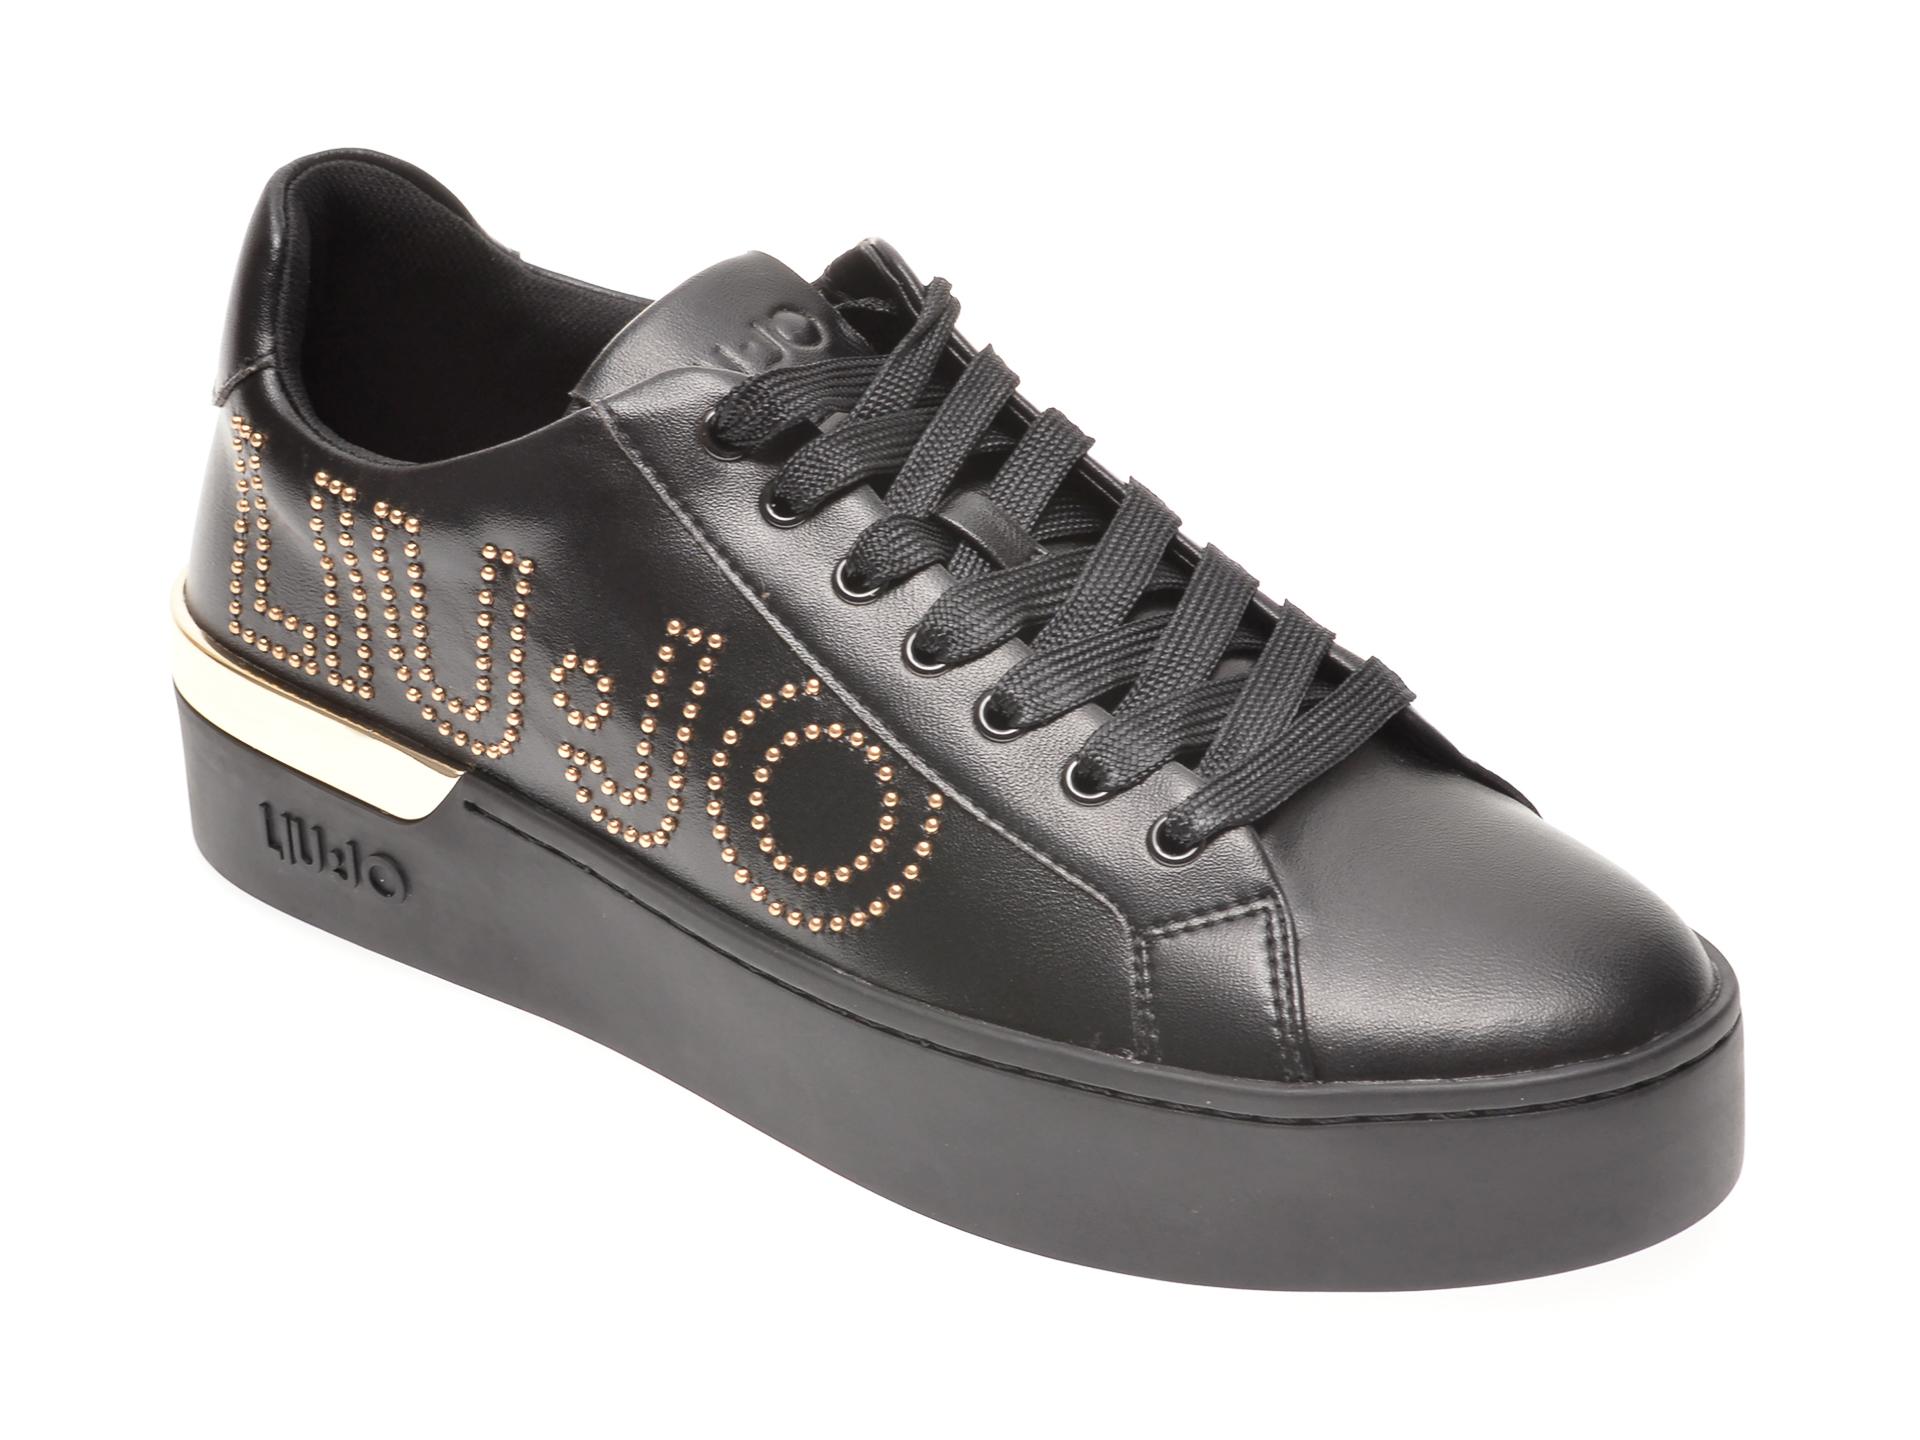 Pantofi sport LIU JO negri, SILV10, din piele ecologica